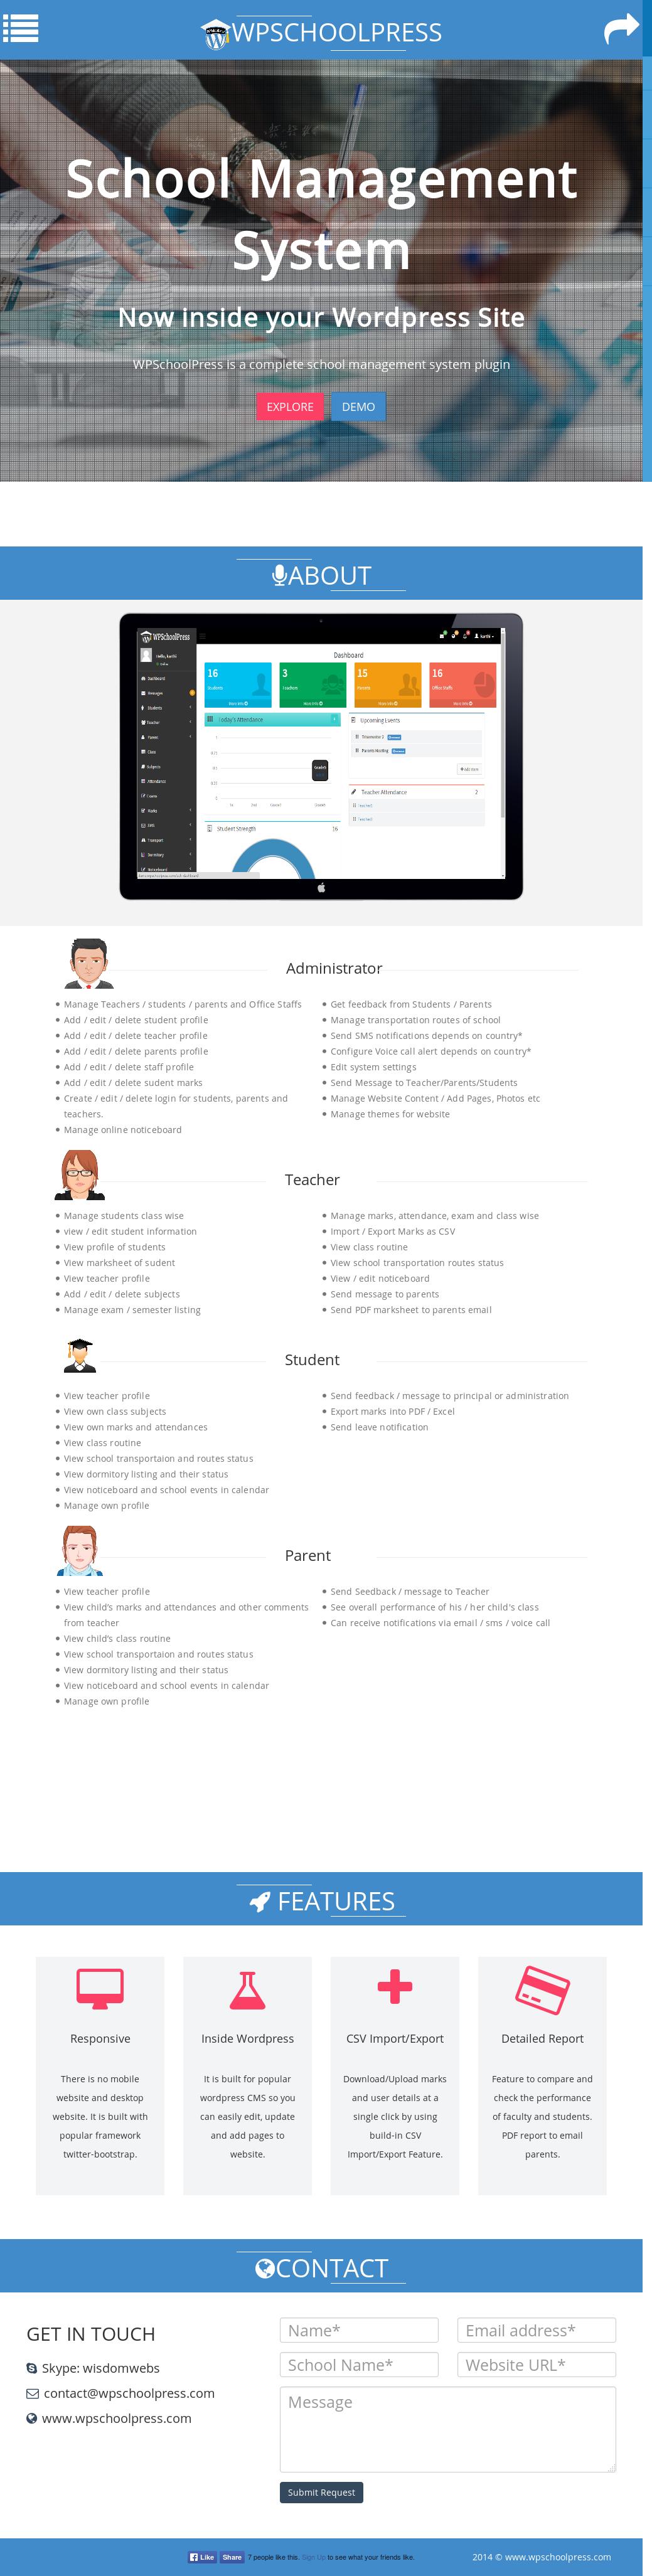 Wpschoolpress Competitors, Revenue and Employees - Owler Company Profile